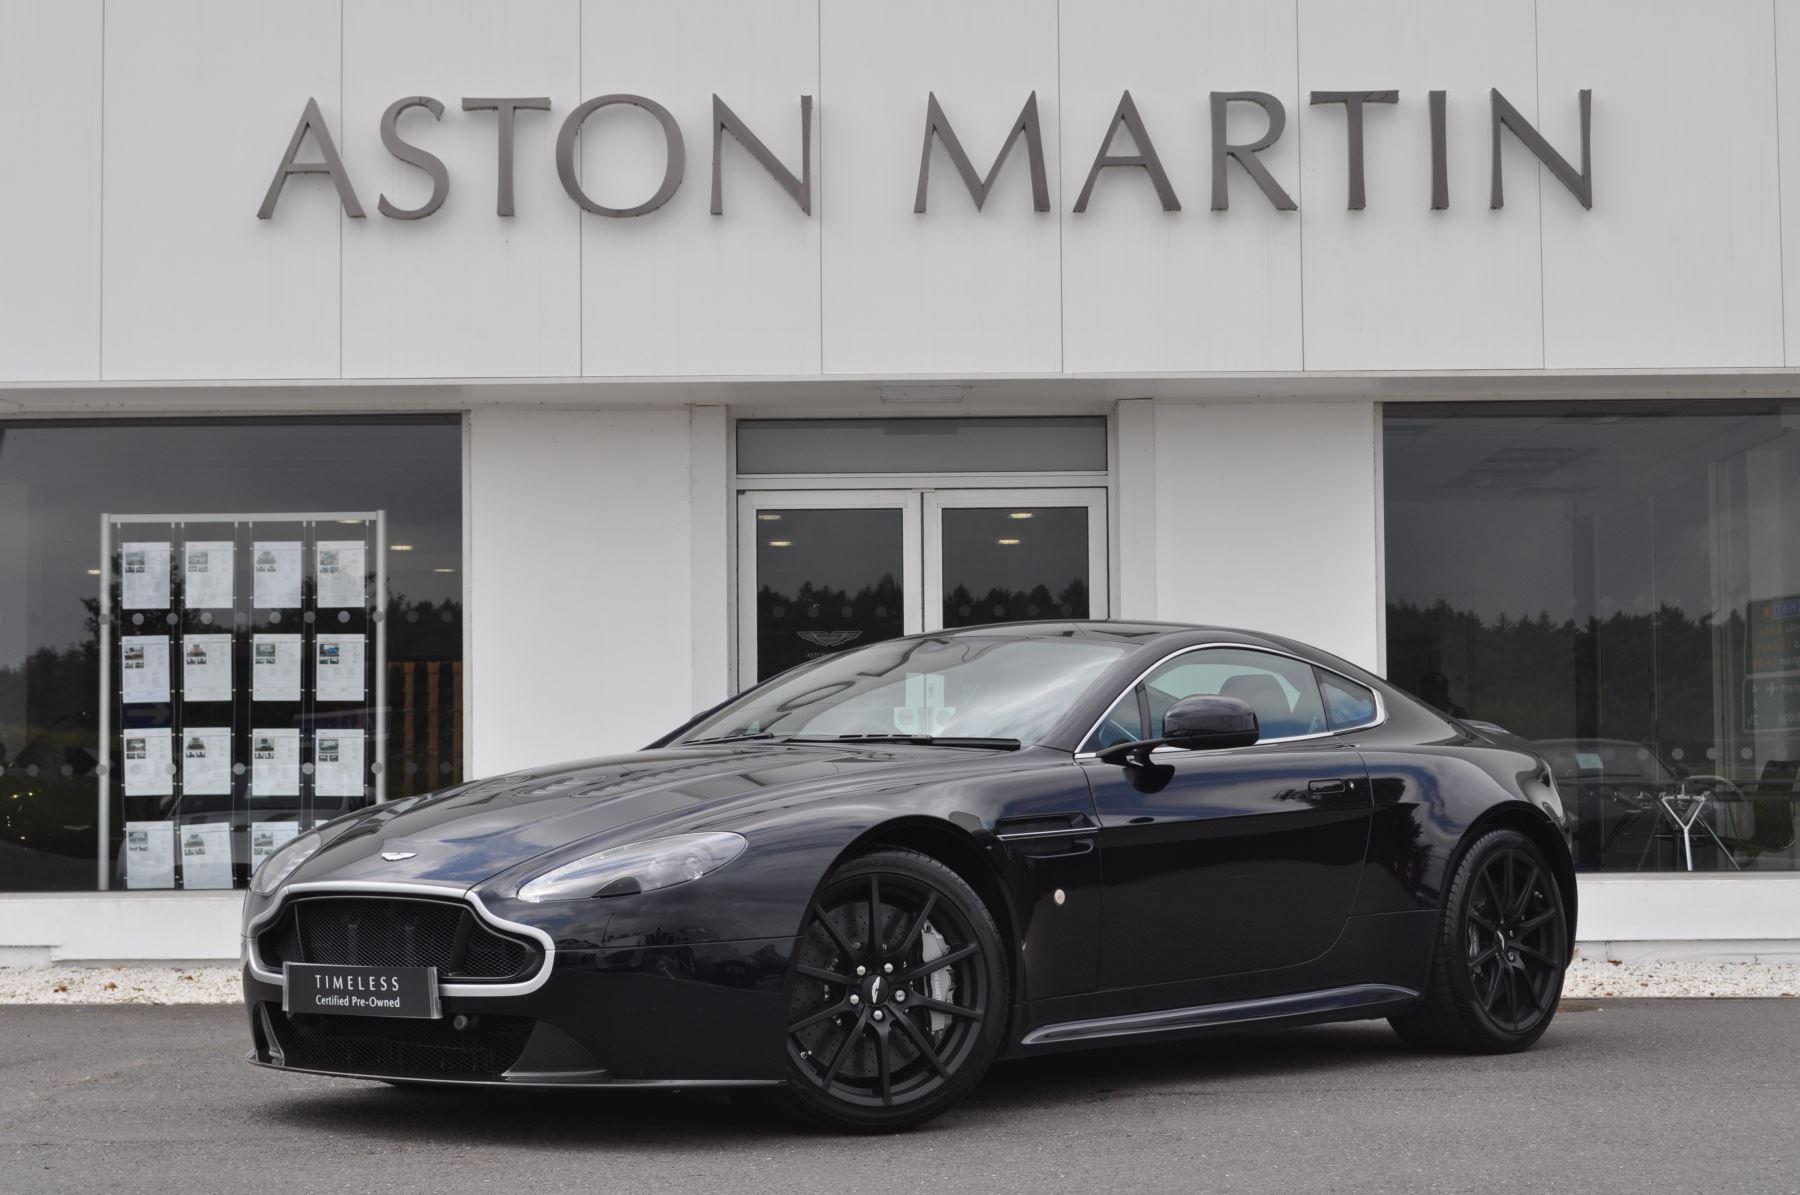 Aston Martin V12 Vantage S S 2dr Sportshift III 5.9 Automatic 3 door on